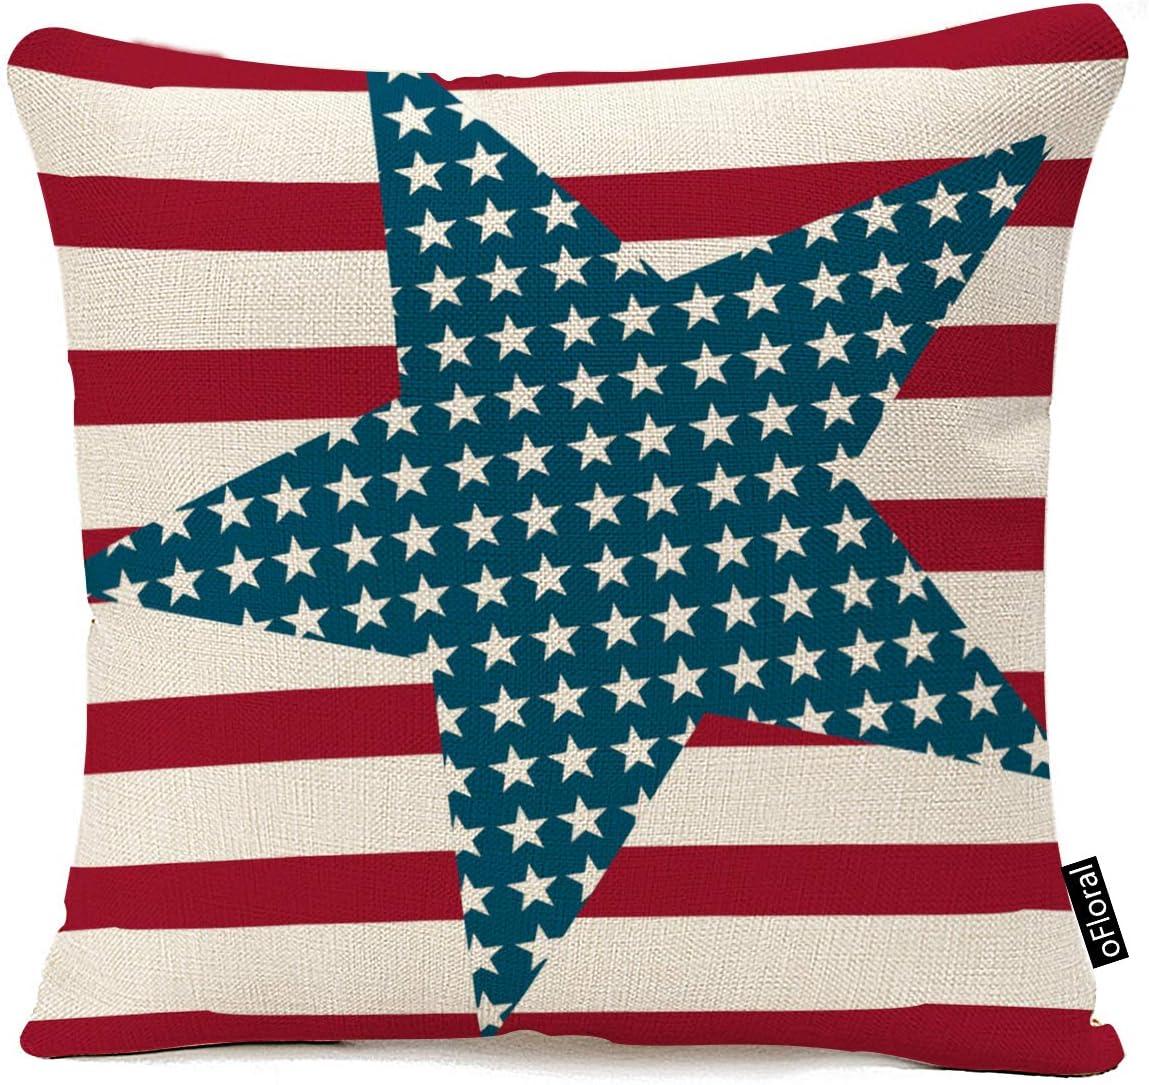 oFloral 4th July Vintage American Flag Patriotic Ornate Amenrican Flag Sofa Waist Throw Cushion Cover Pillow Case 18 x 18 Inch